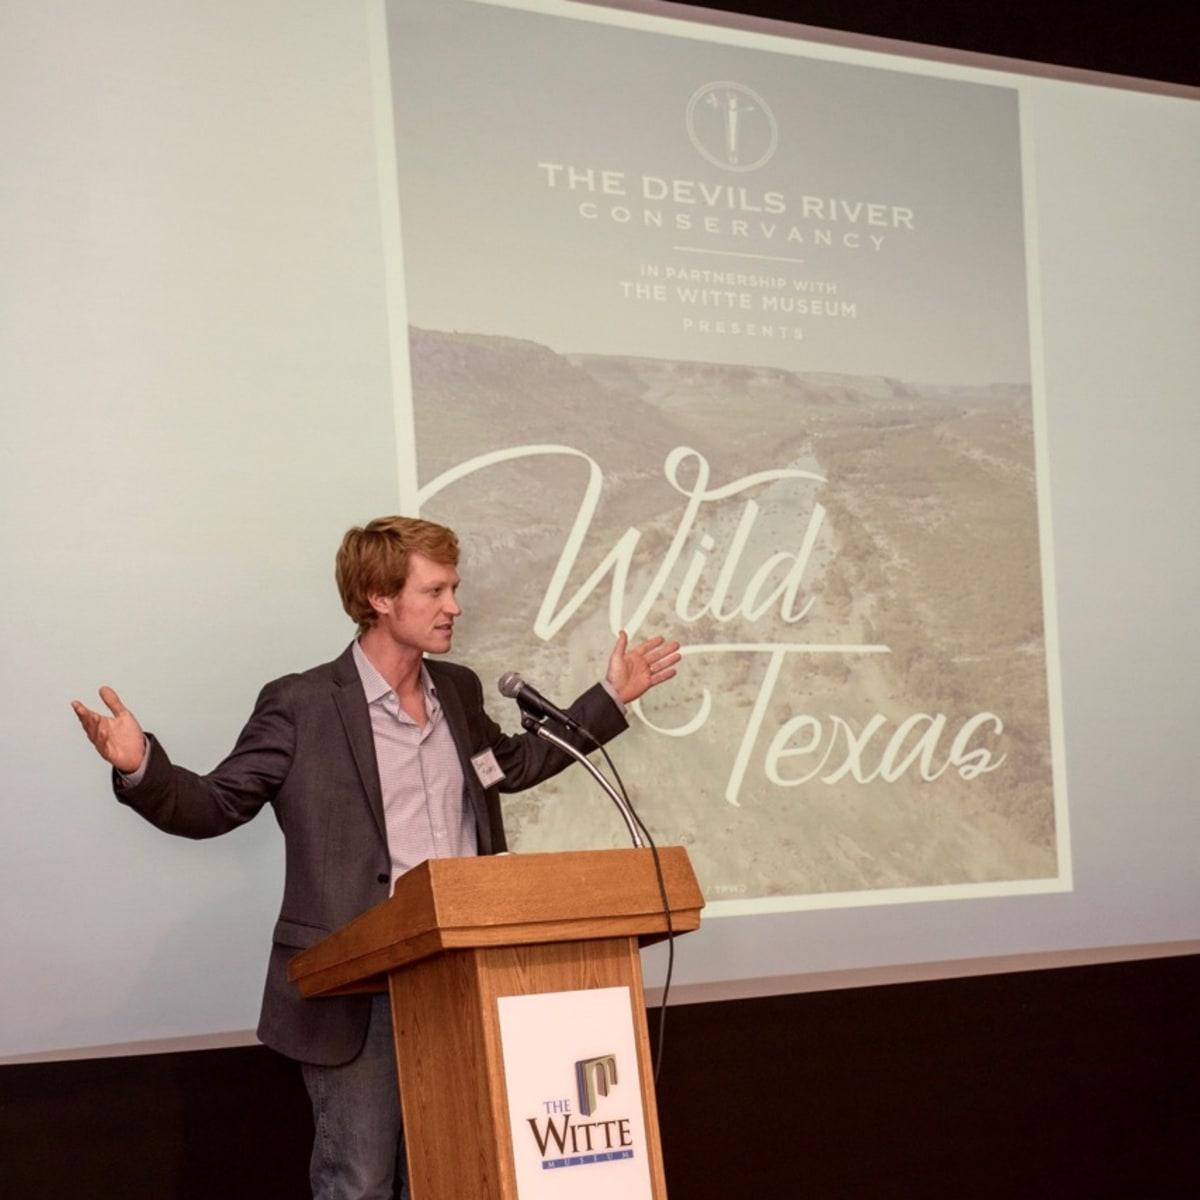 Wild Texas Witte Museum